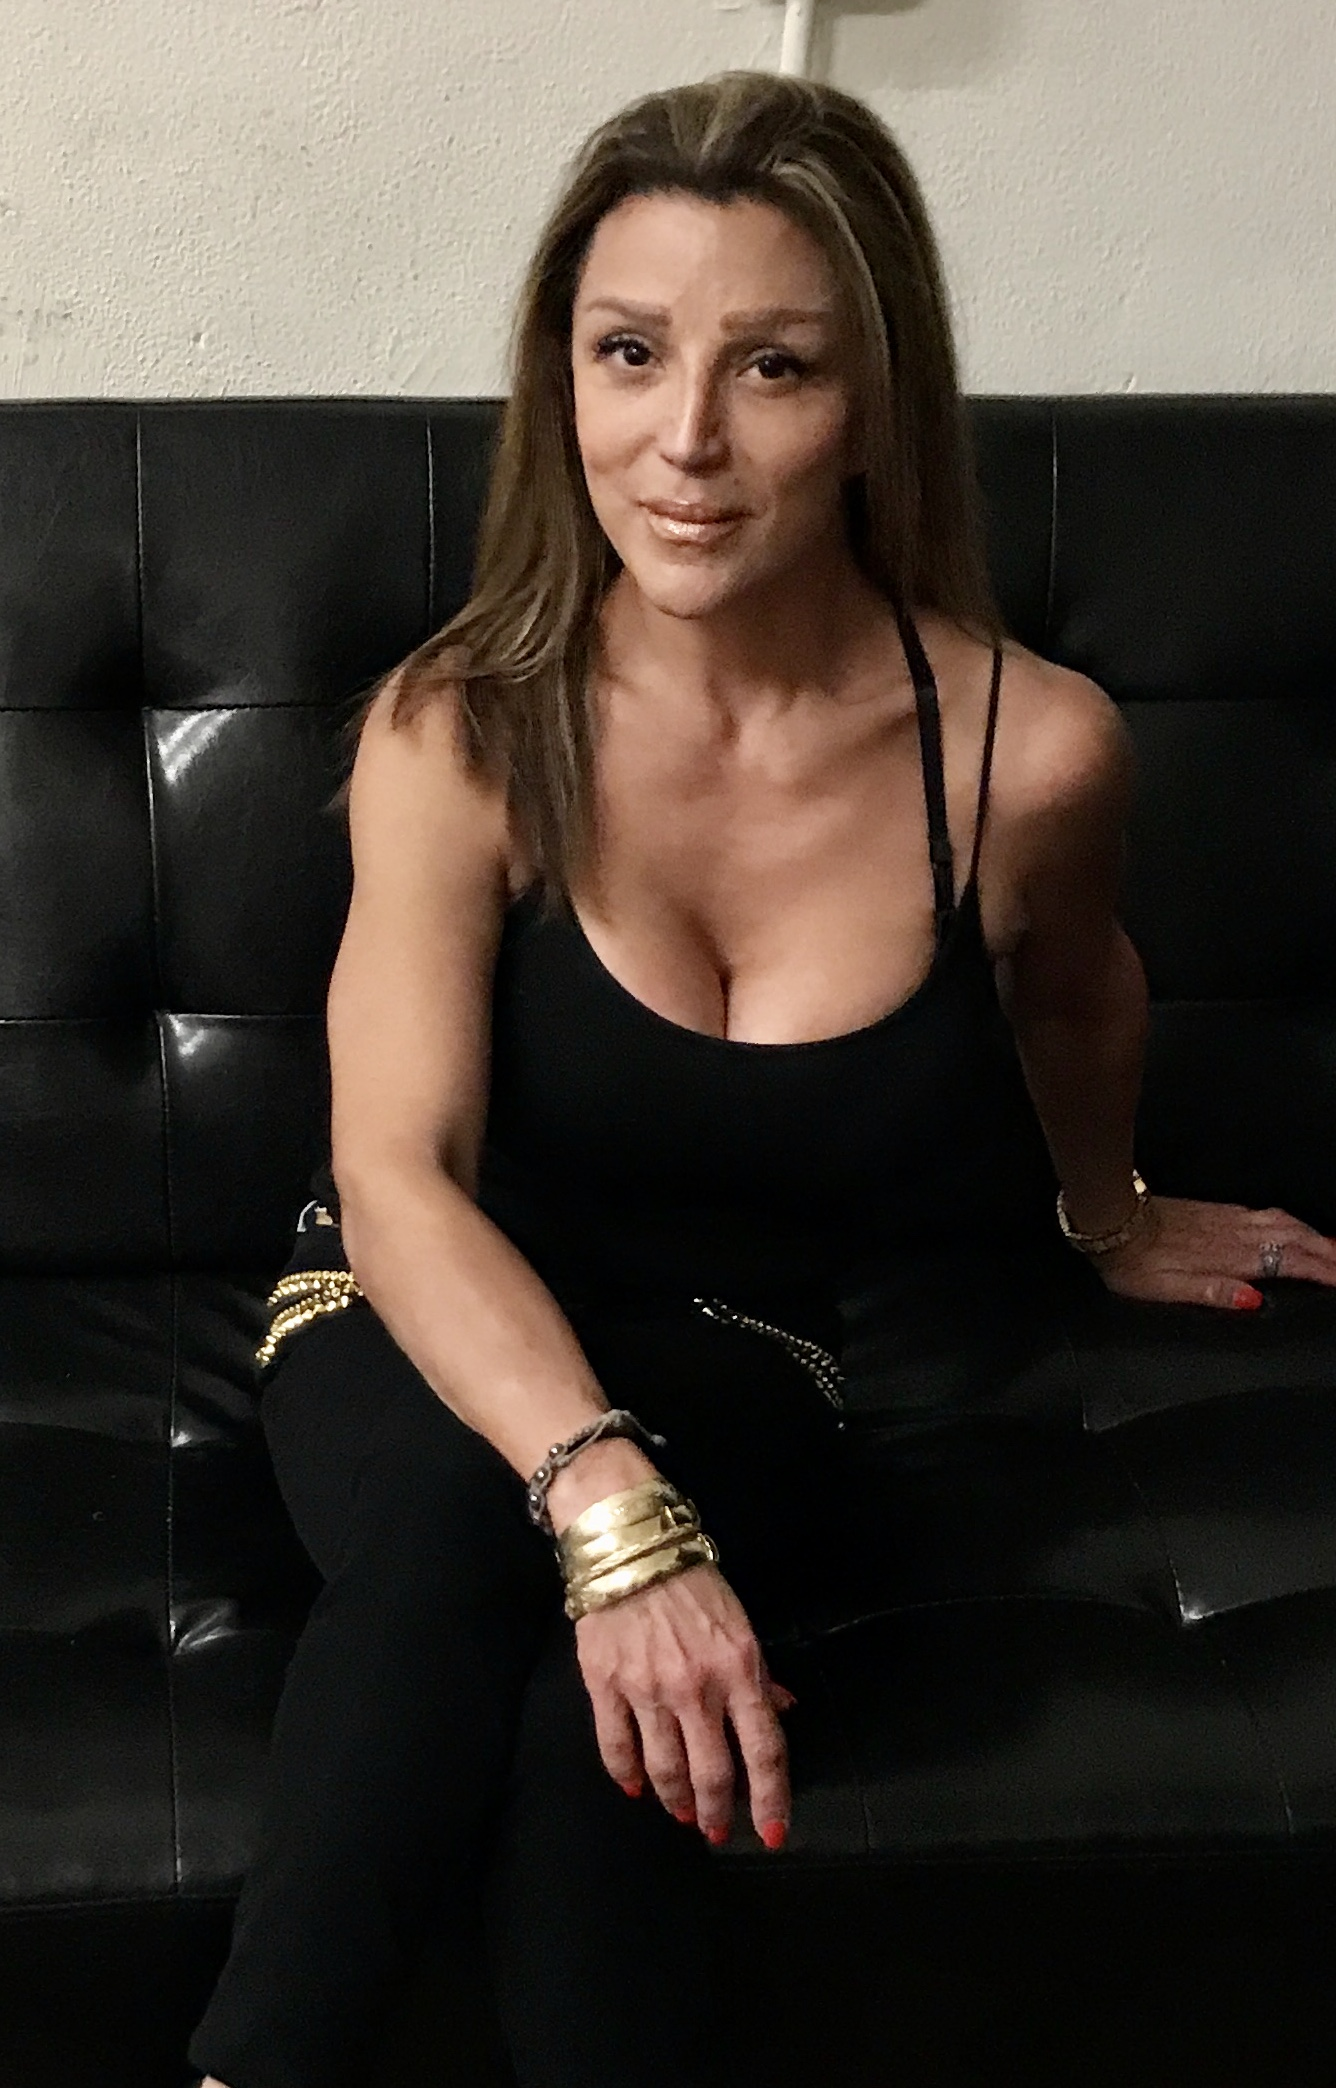 Amalia Profile, Escort in Los Angeles, 3233660018